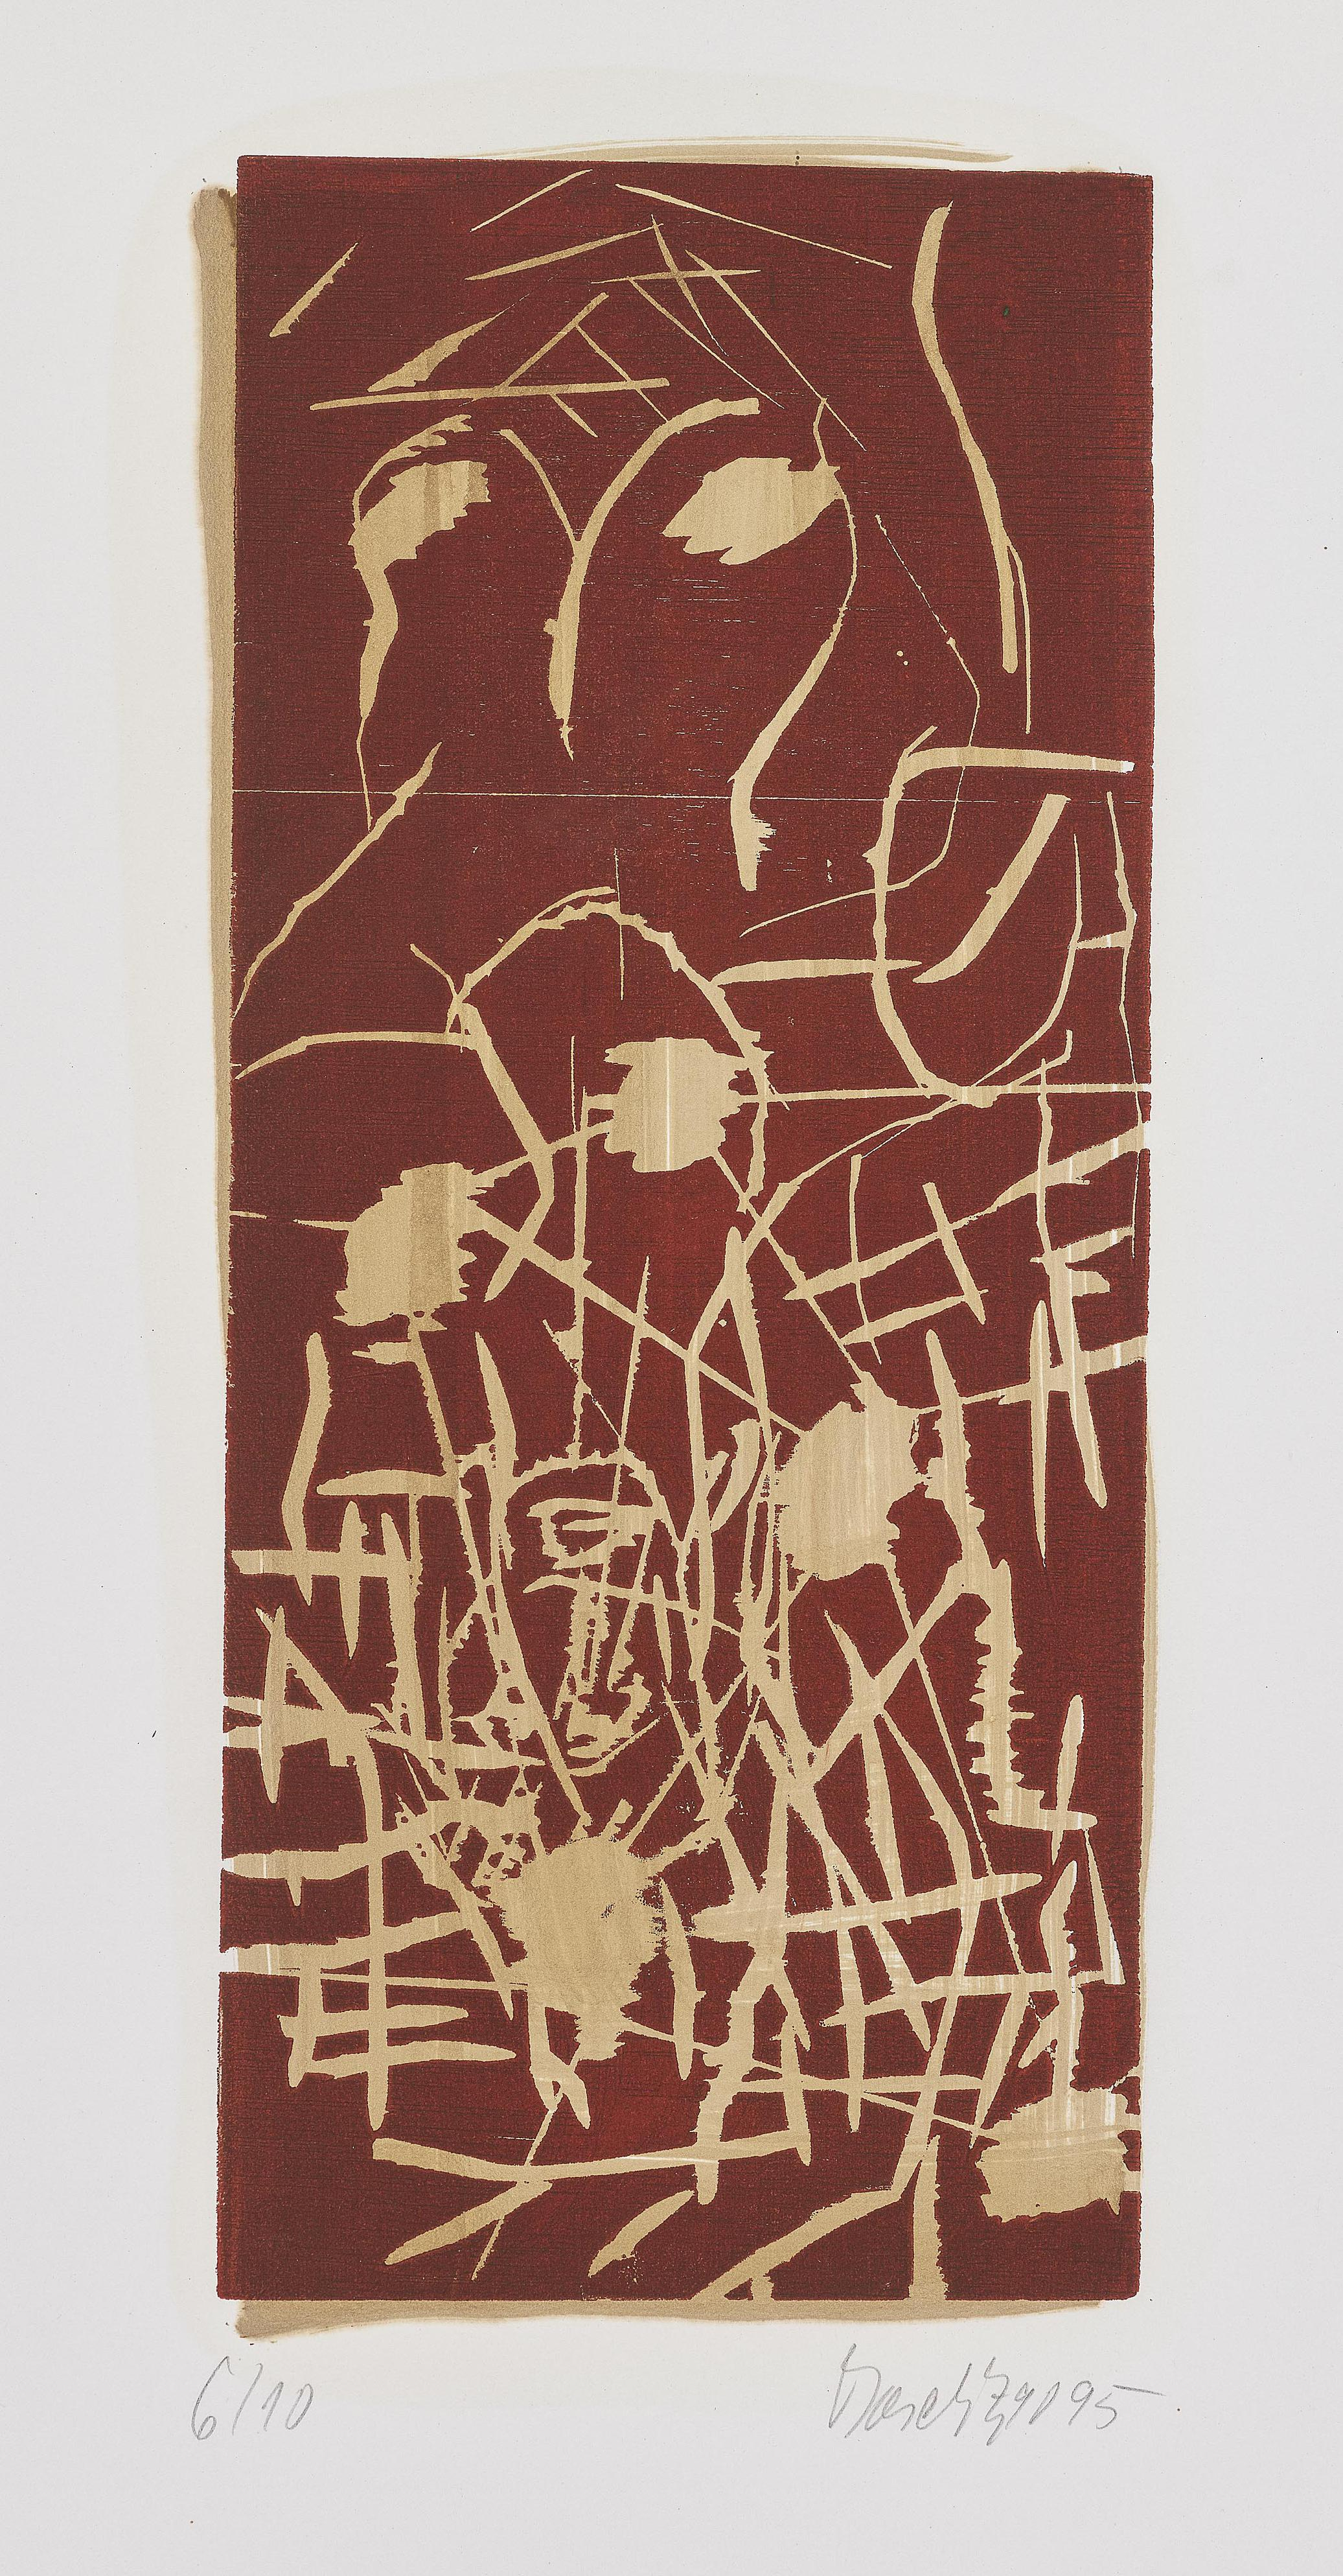 Georg Baselitz-Margeriten (Daisies)-1995